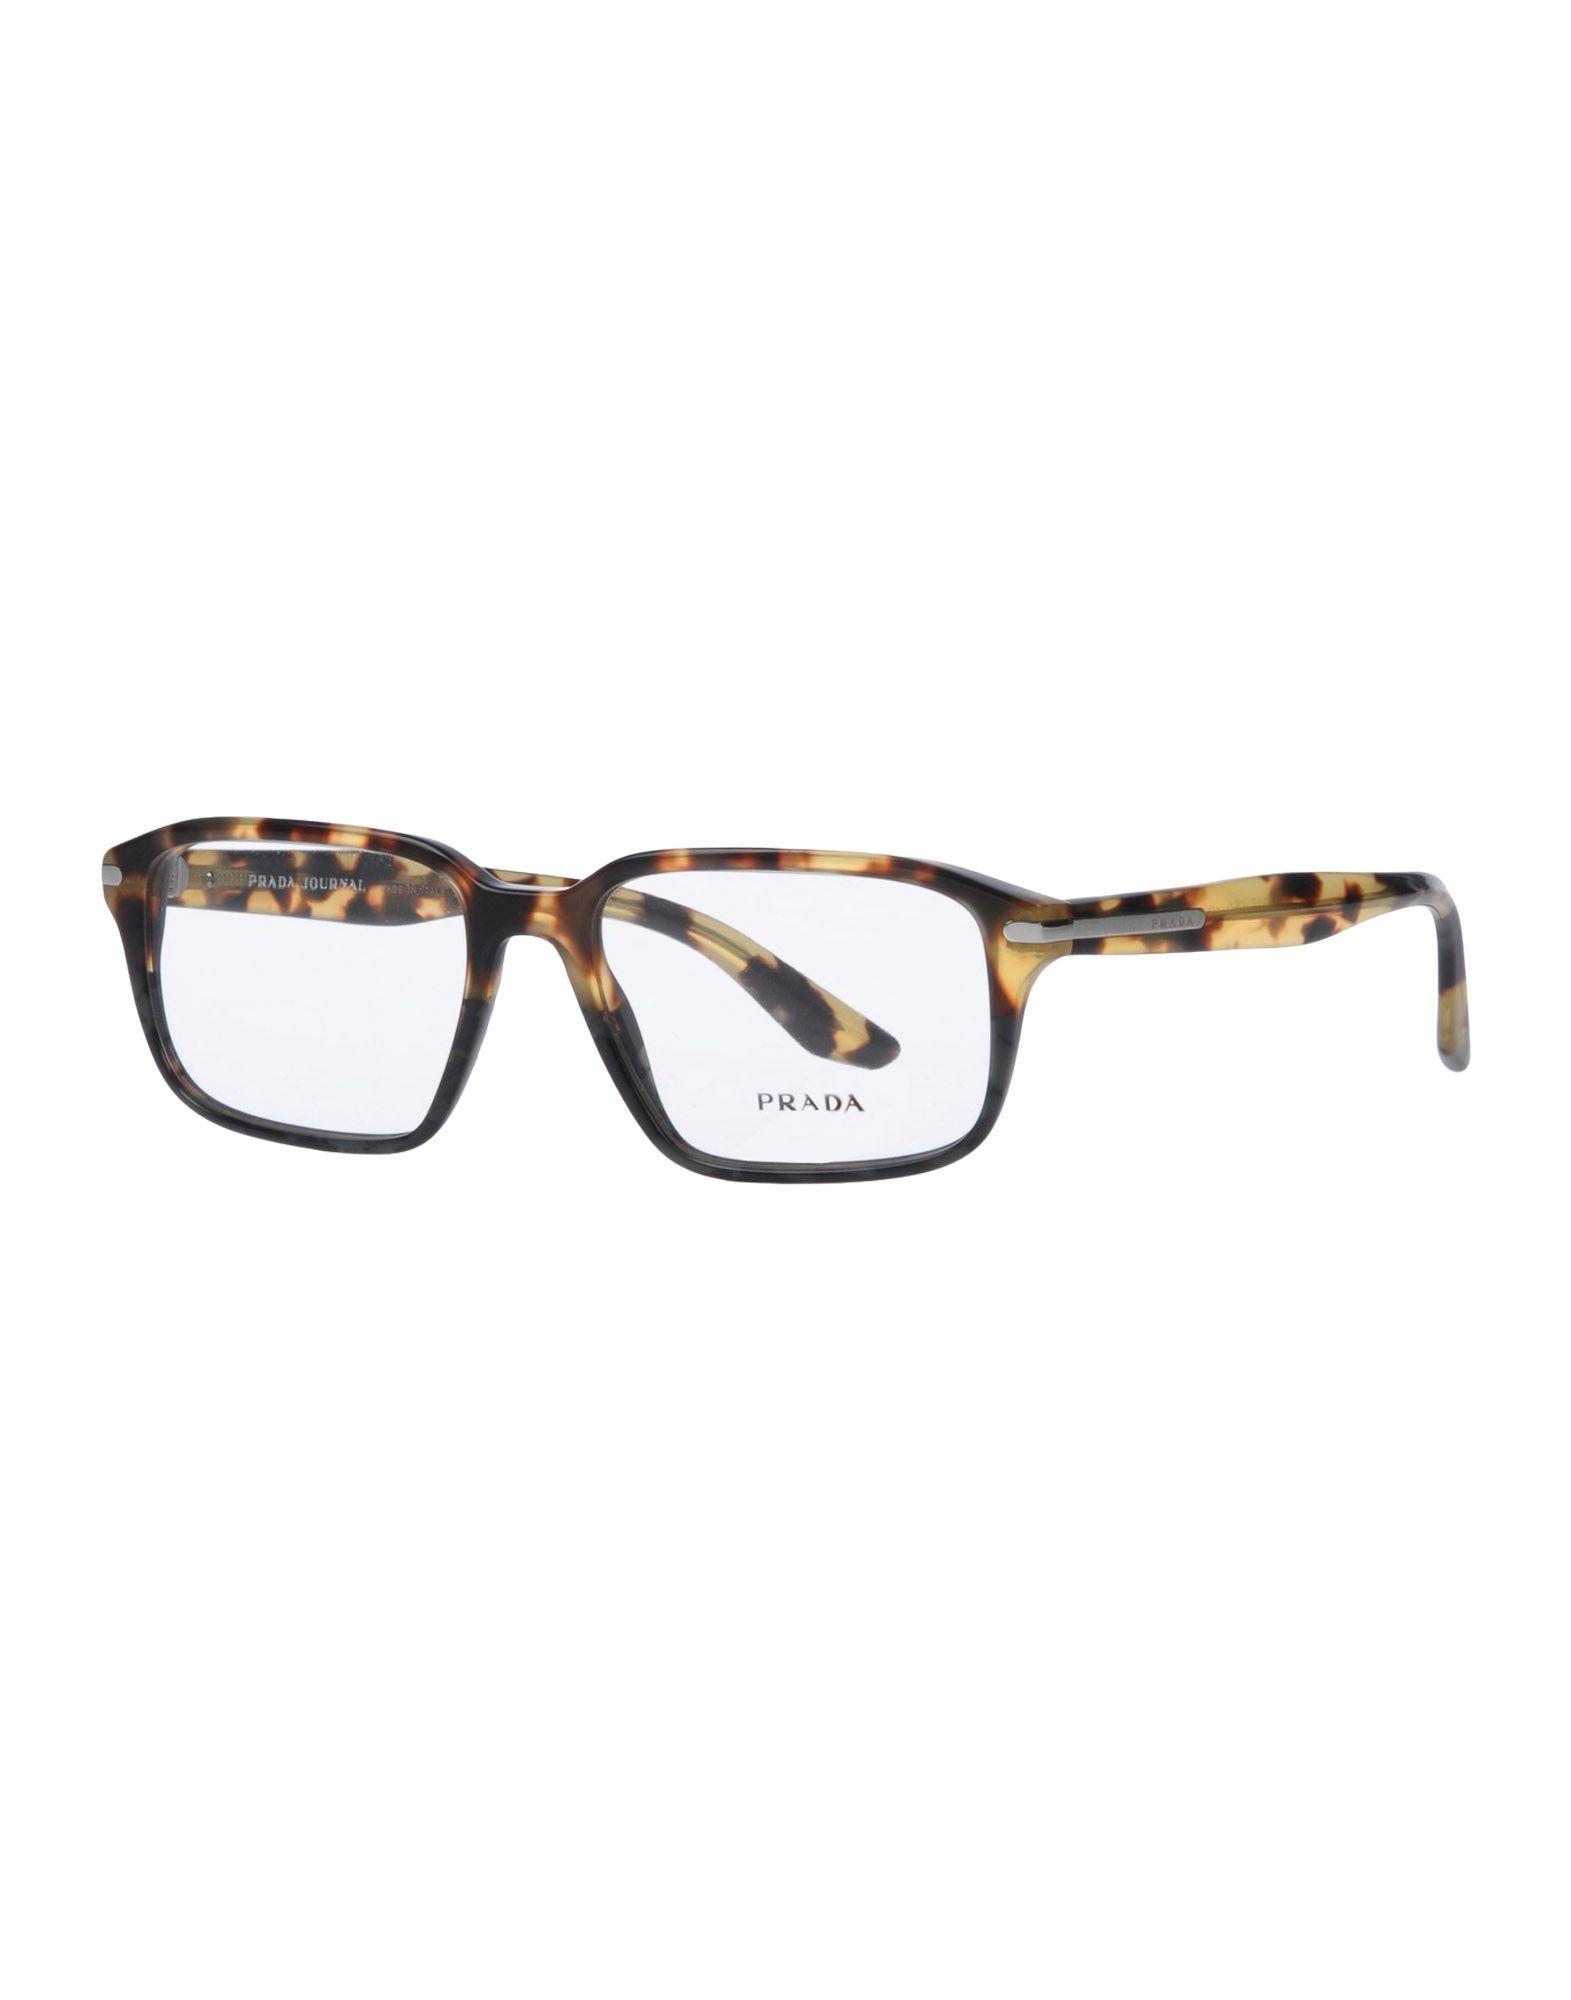 PRADA Herren Brille Farbe Khaki Größe 1